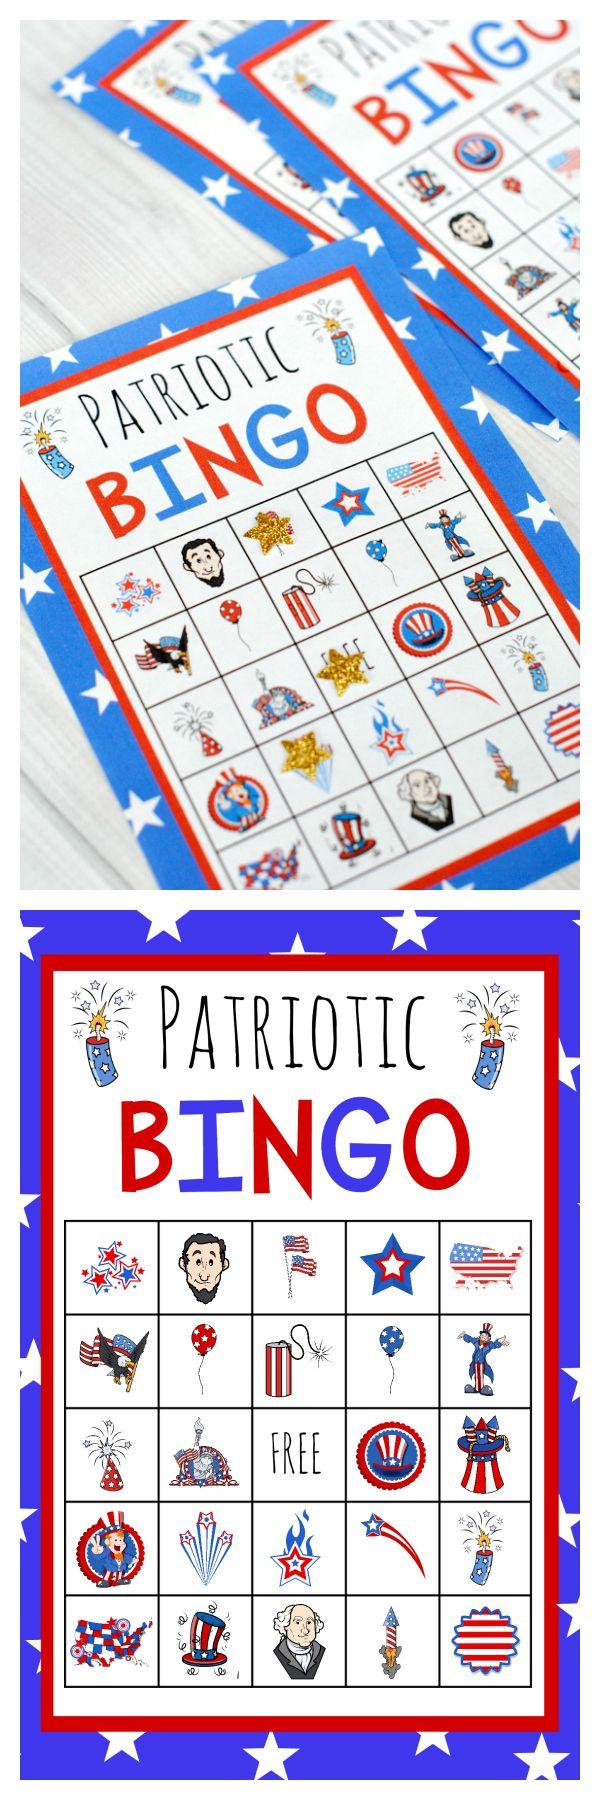 Patriotic 4th Of July Bingo Game To Print July Crafts